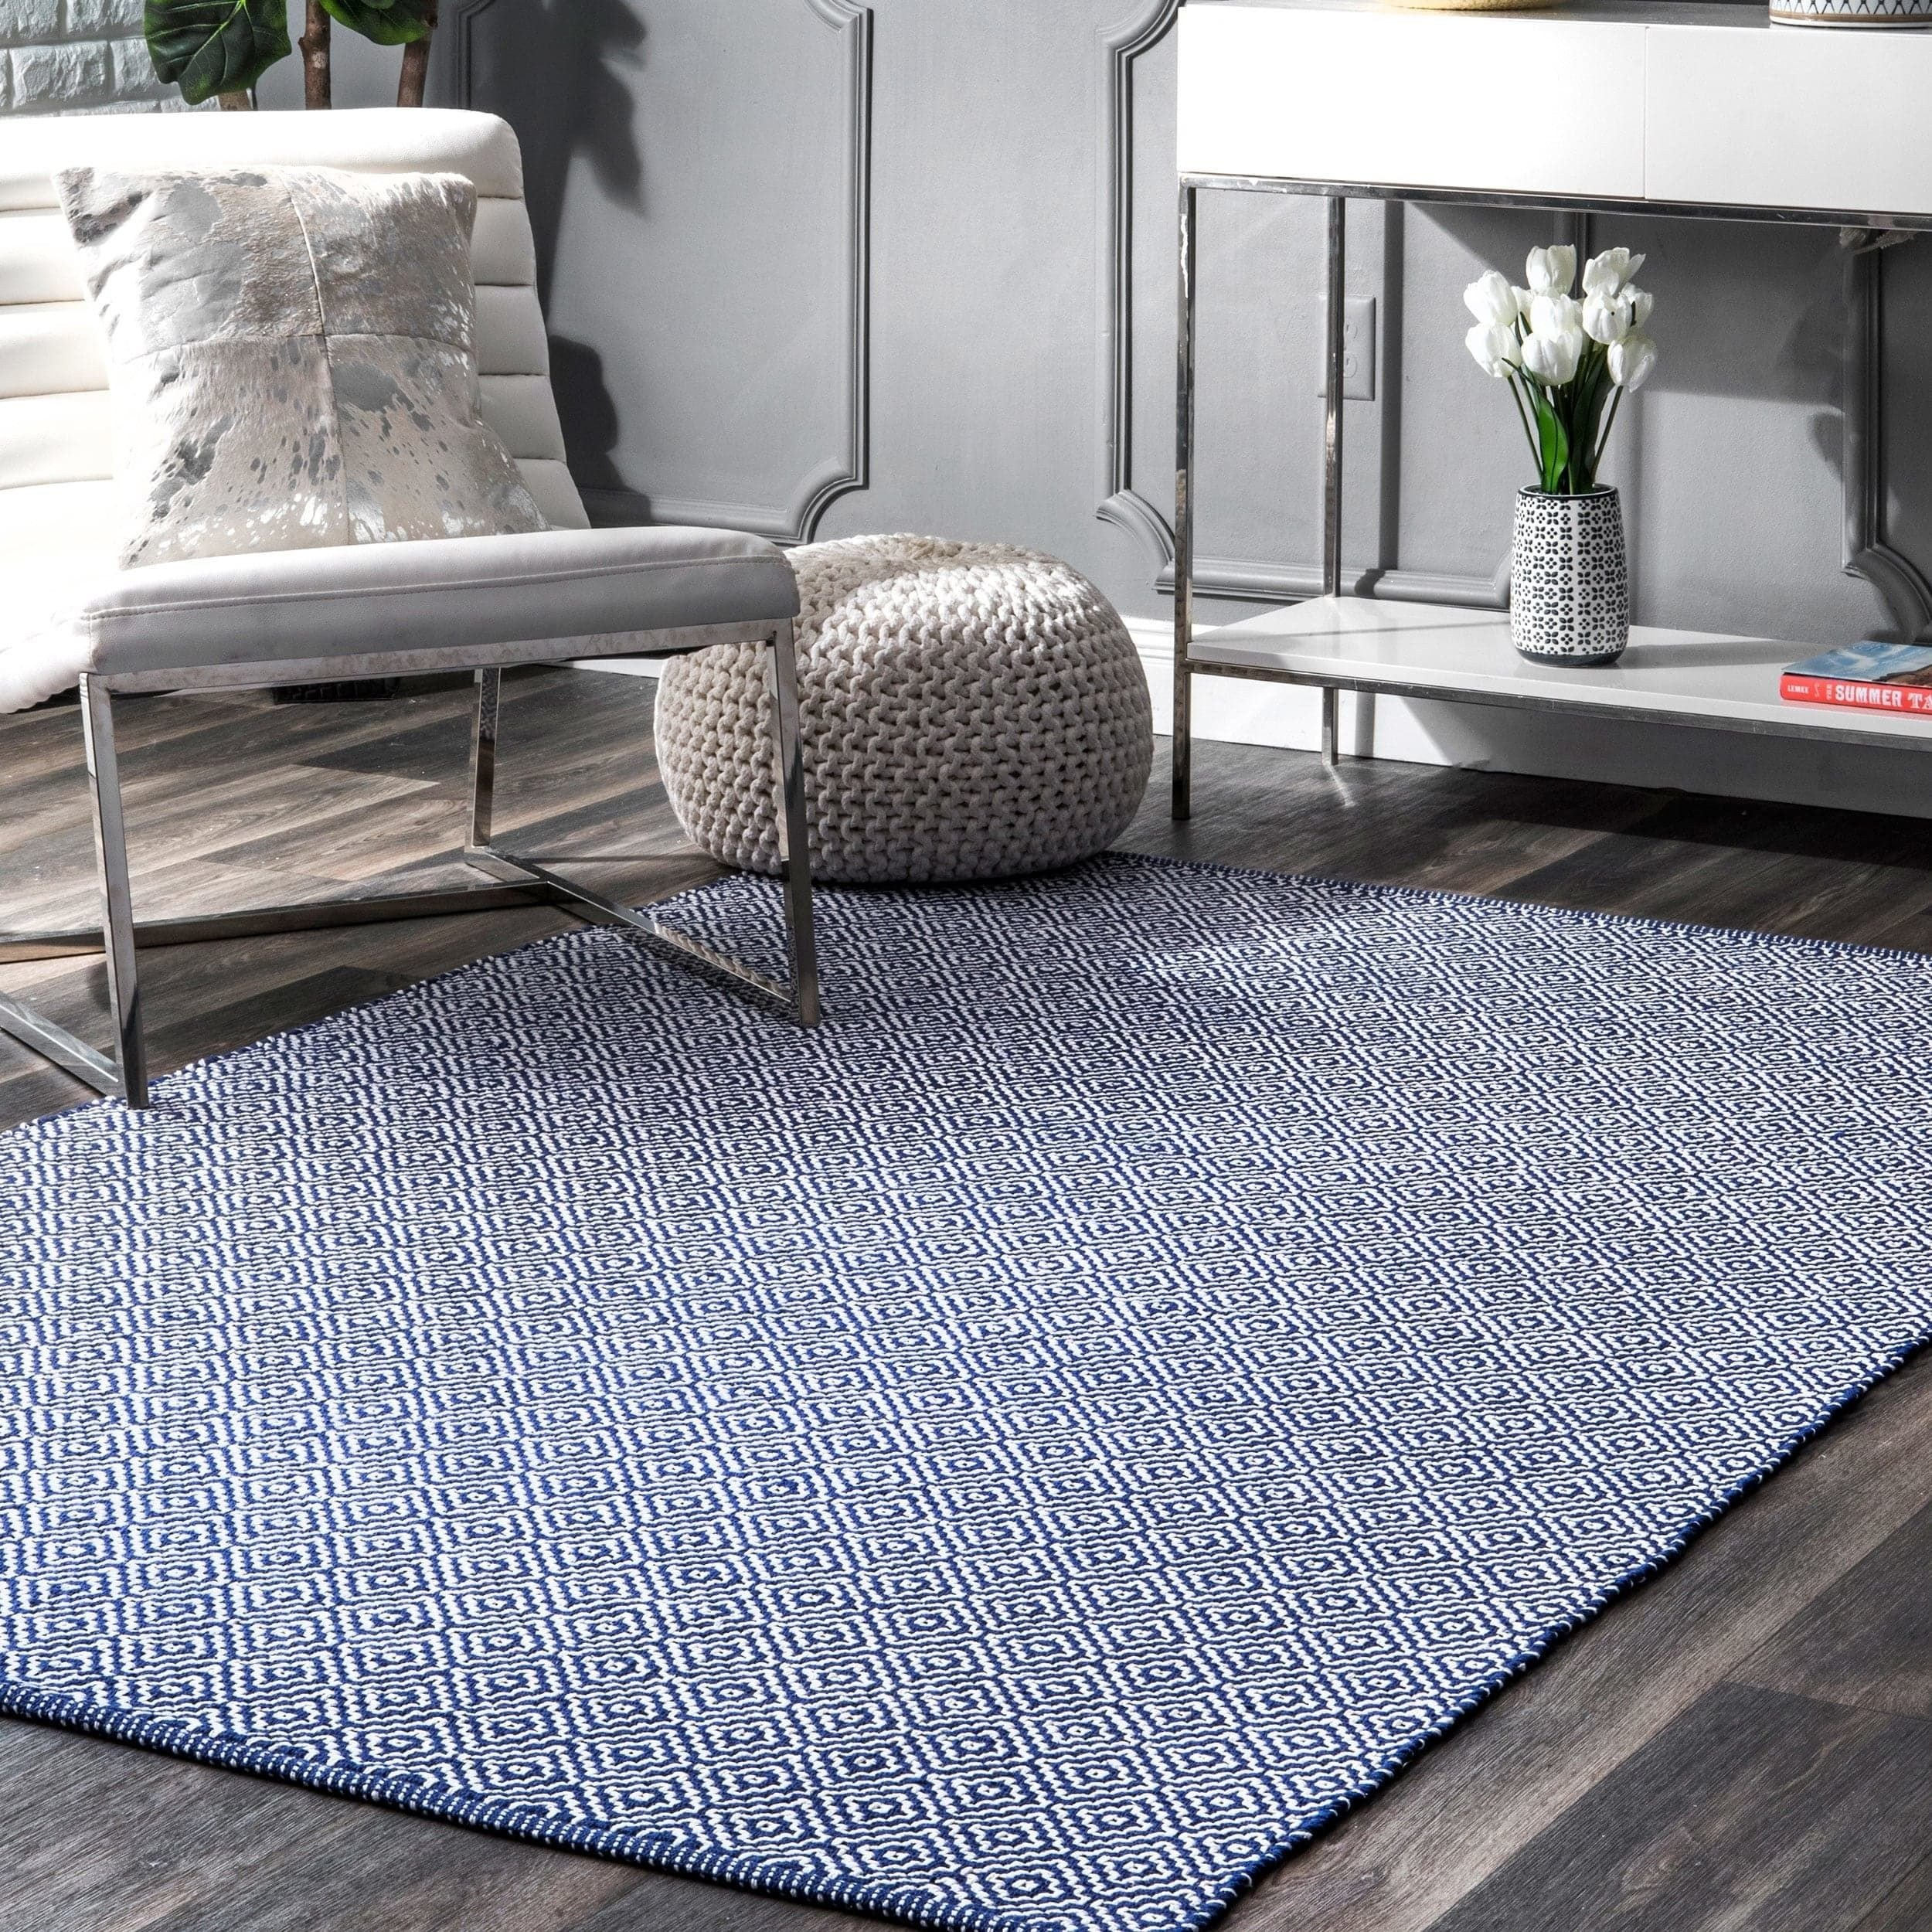 Area Rug for Bedroom Size Unique Nuloom Handmade Flatweave Diamond Cotton area Rug